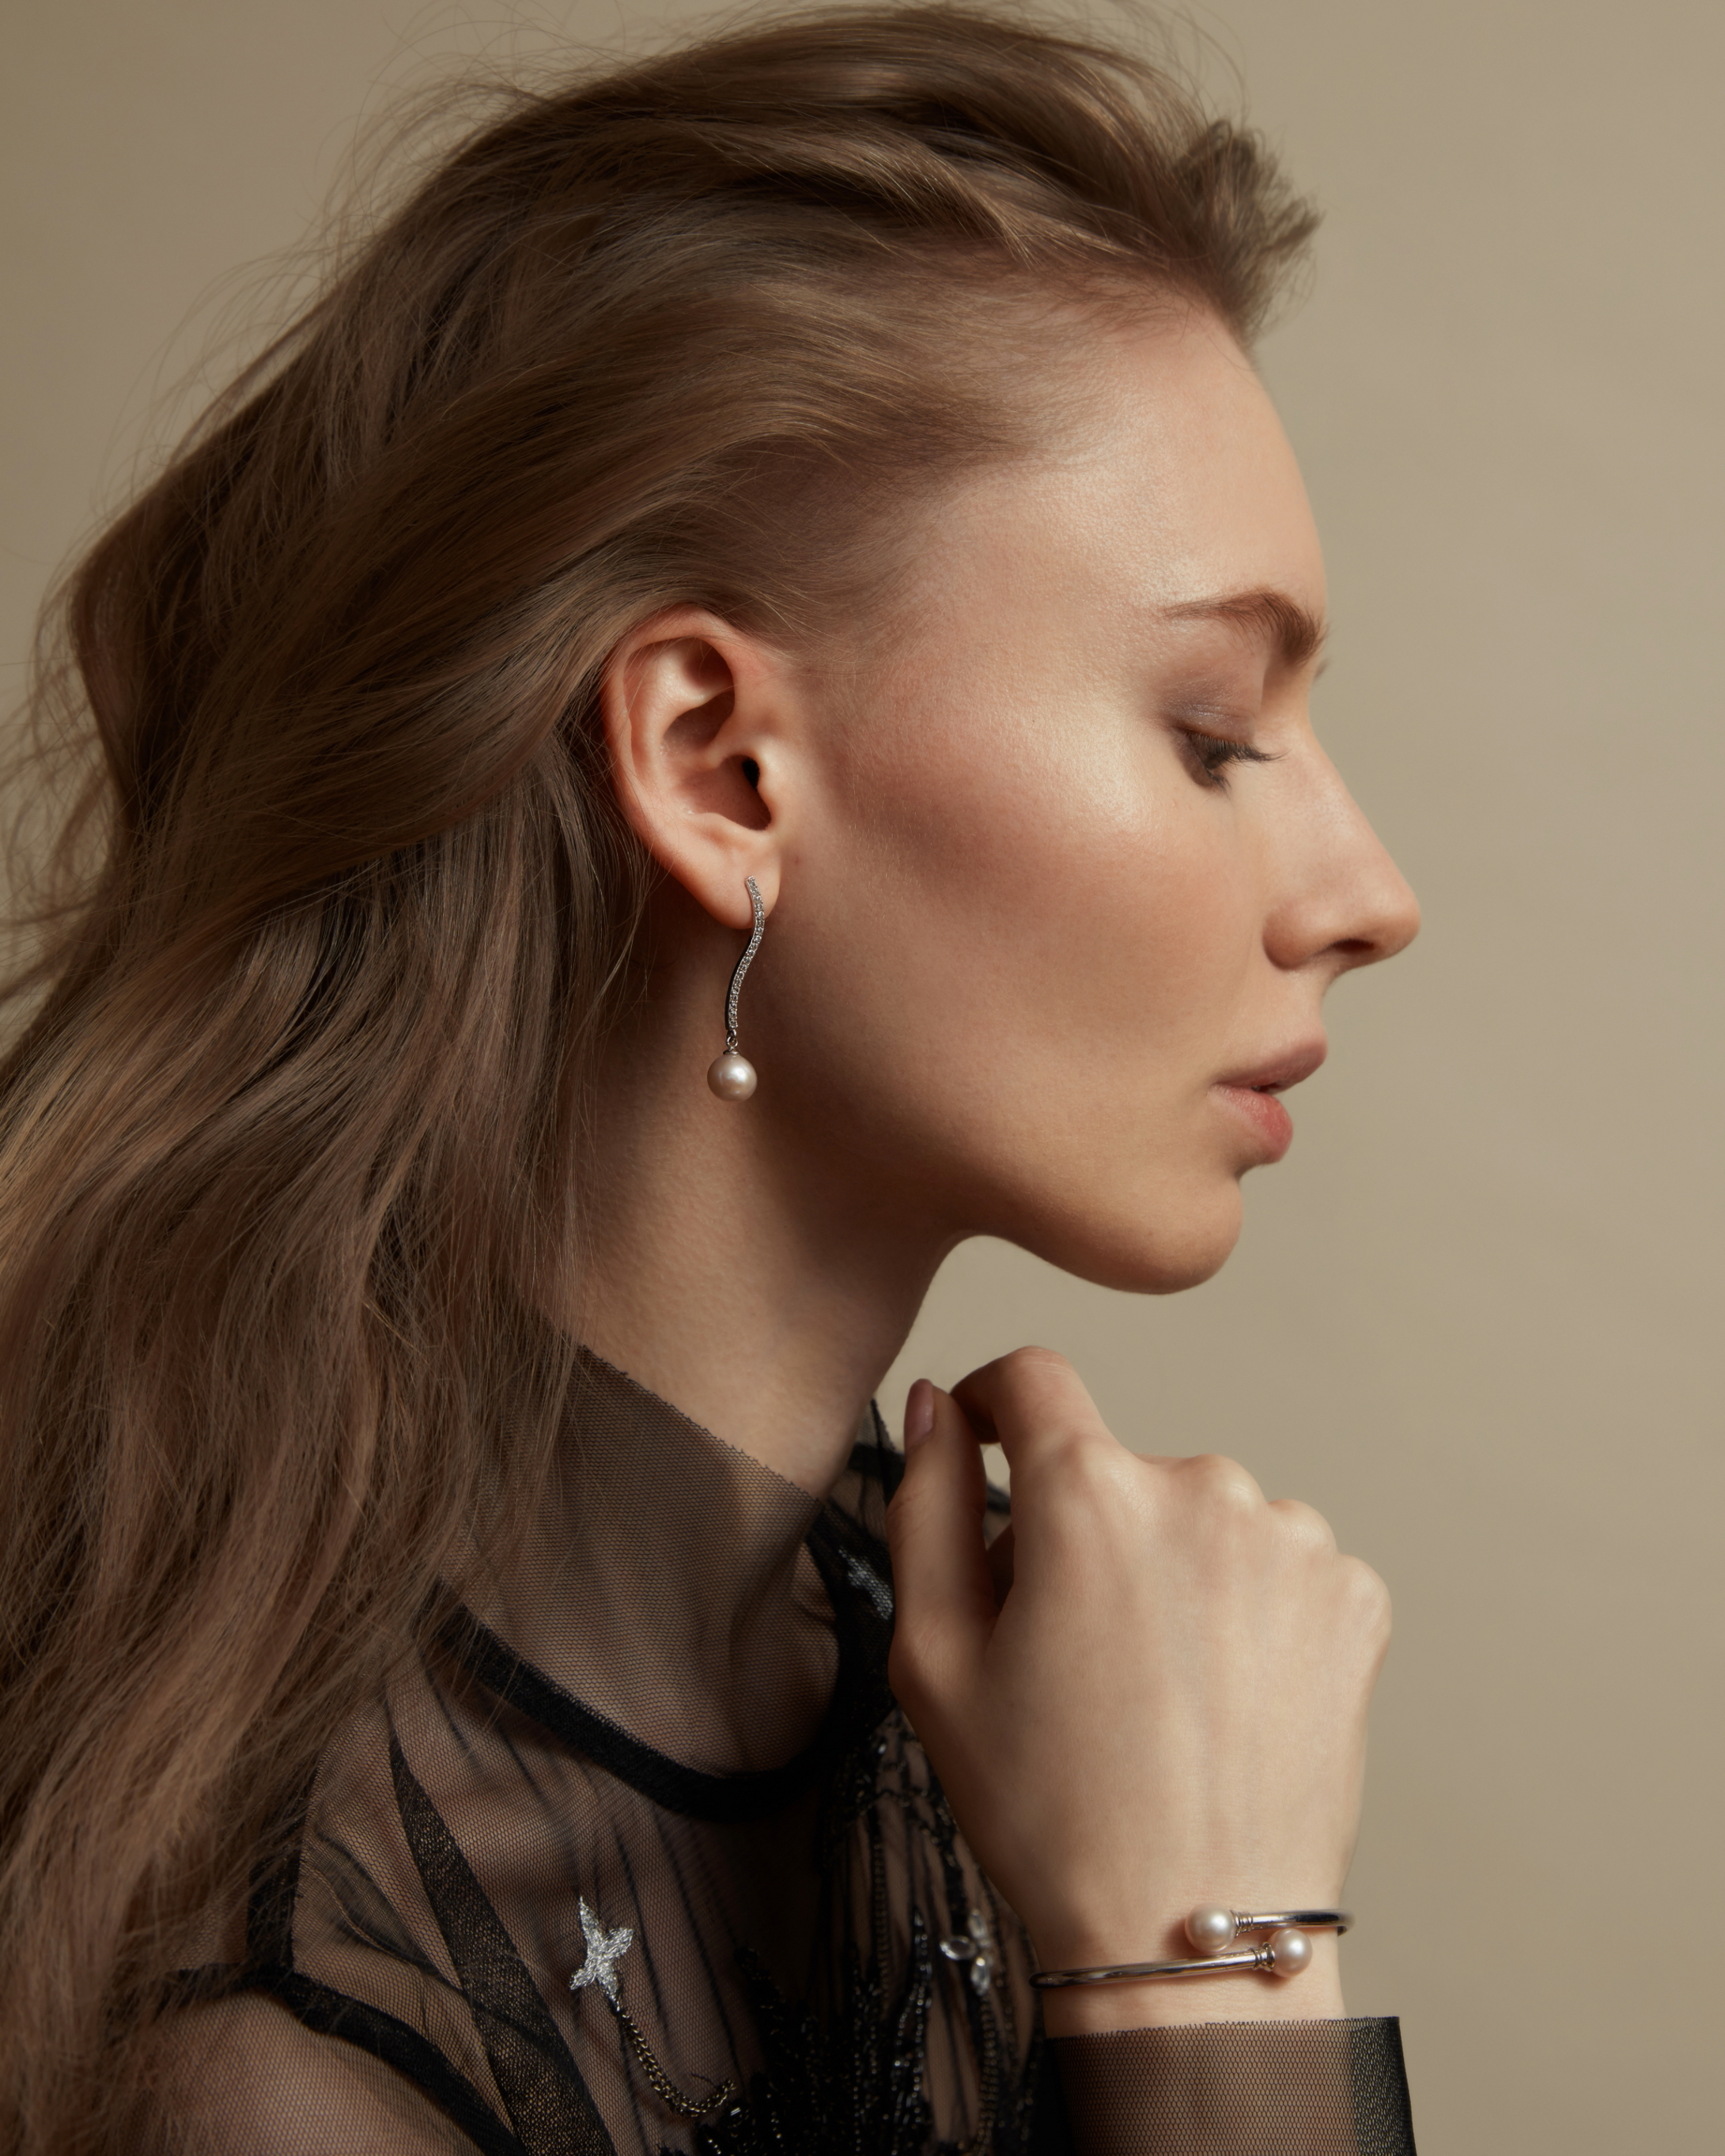 Tali beauty_jewellery-iakovos (1)